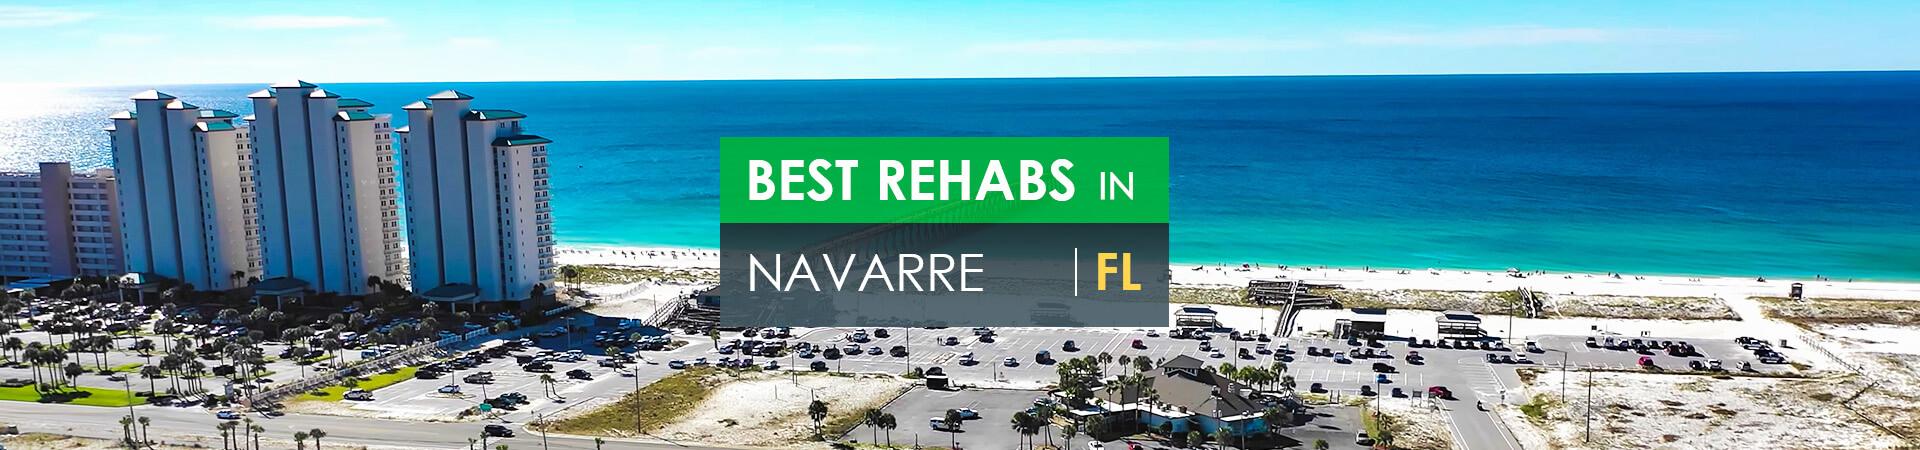 Best rehabs in Navarre, FL